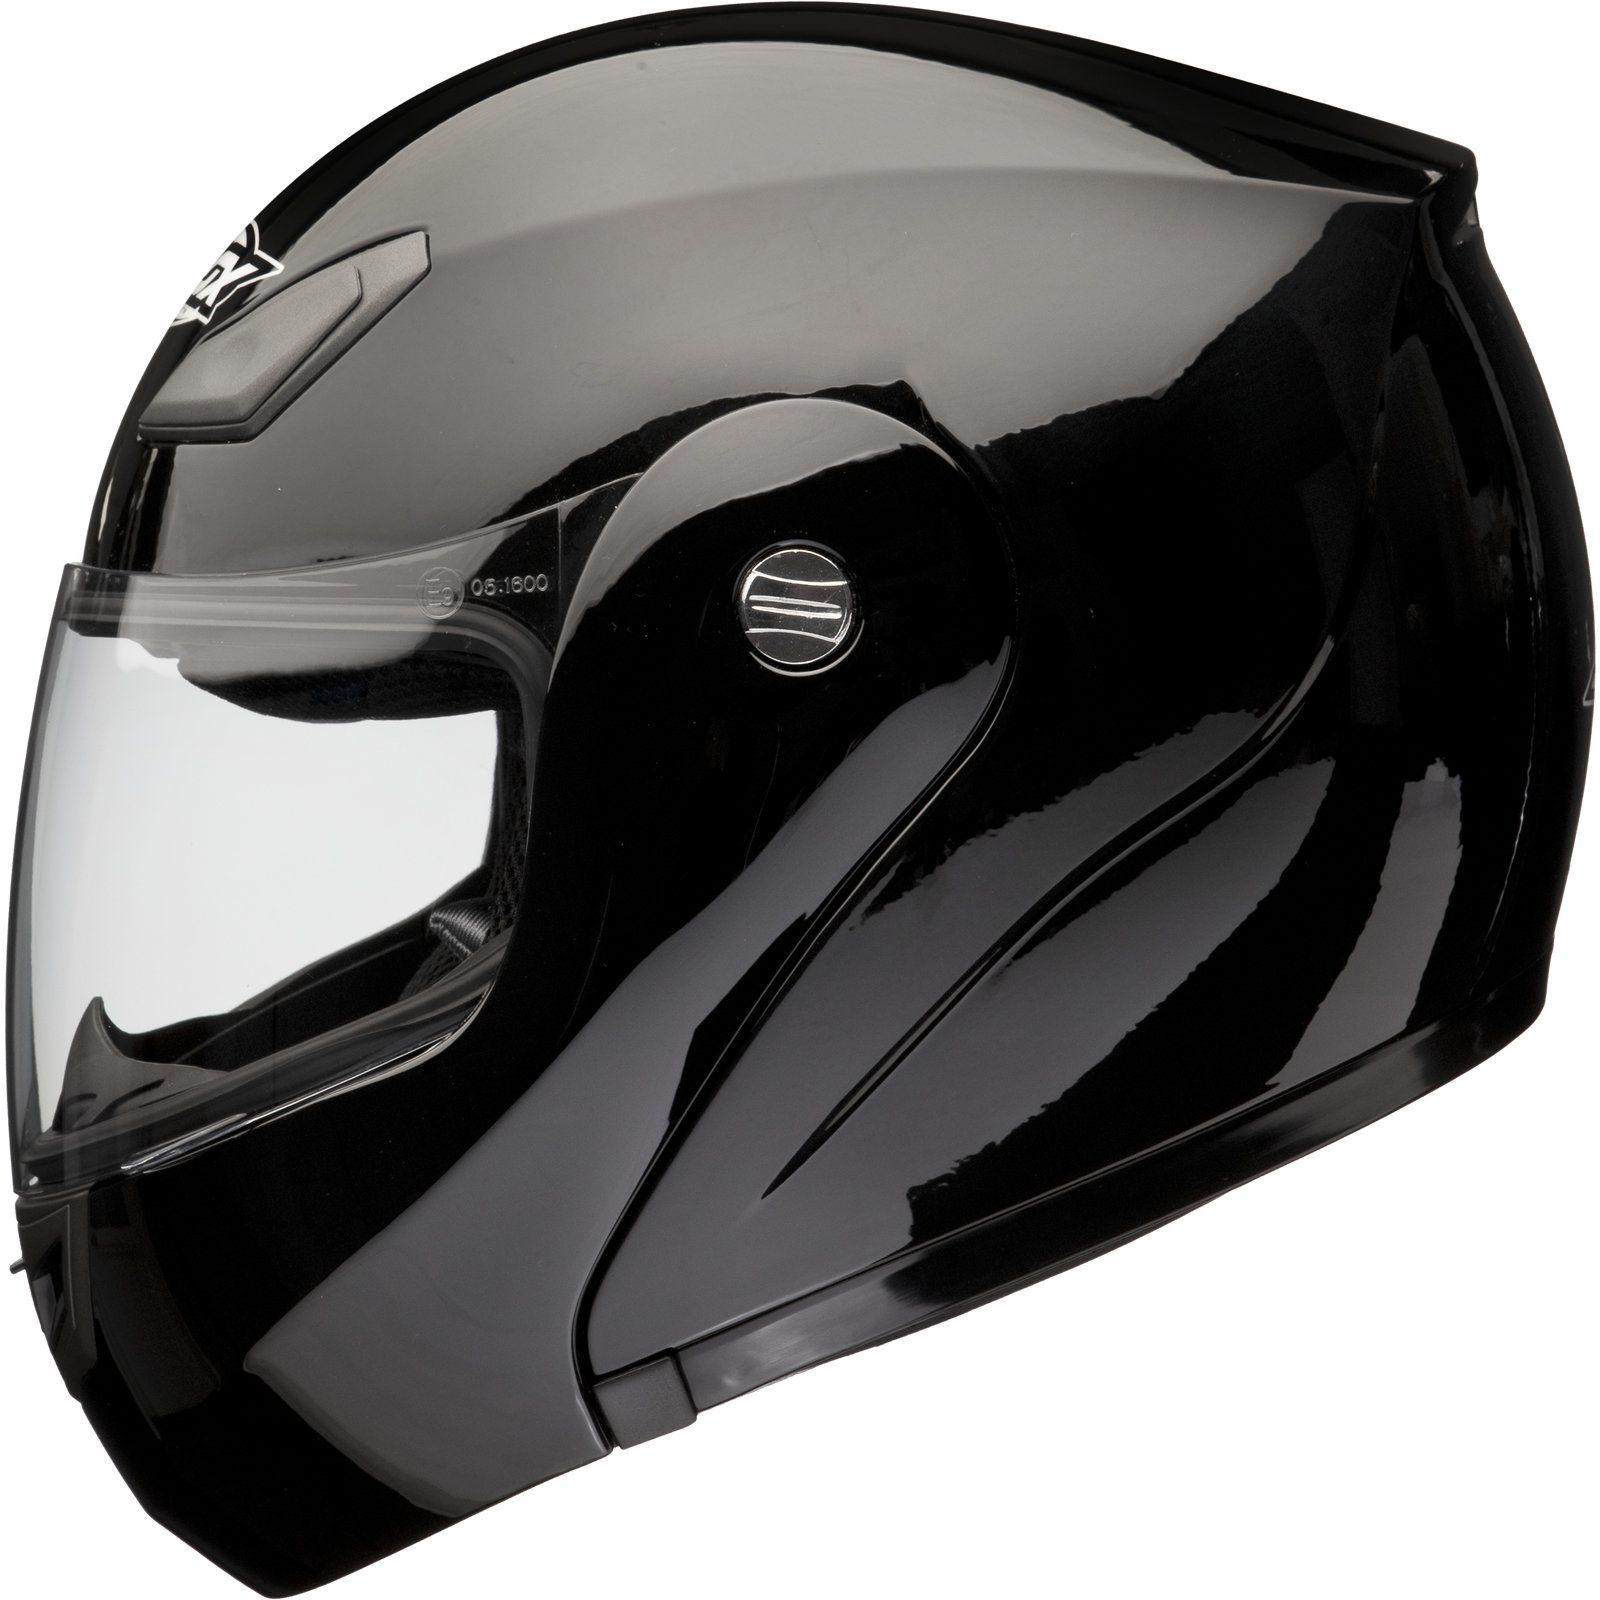 Shox Bullet Flip Front Motorcycle Helmet Amazon Co Uk Sports Outdoors Motorcycle Helmets Helmet Biker Outfit